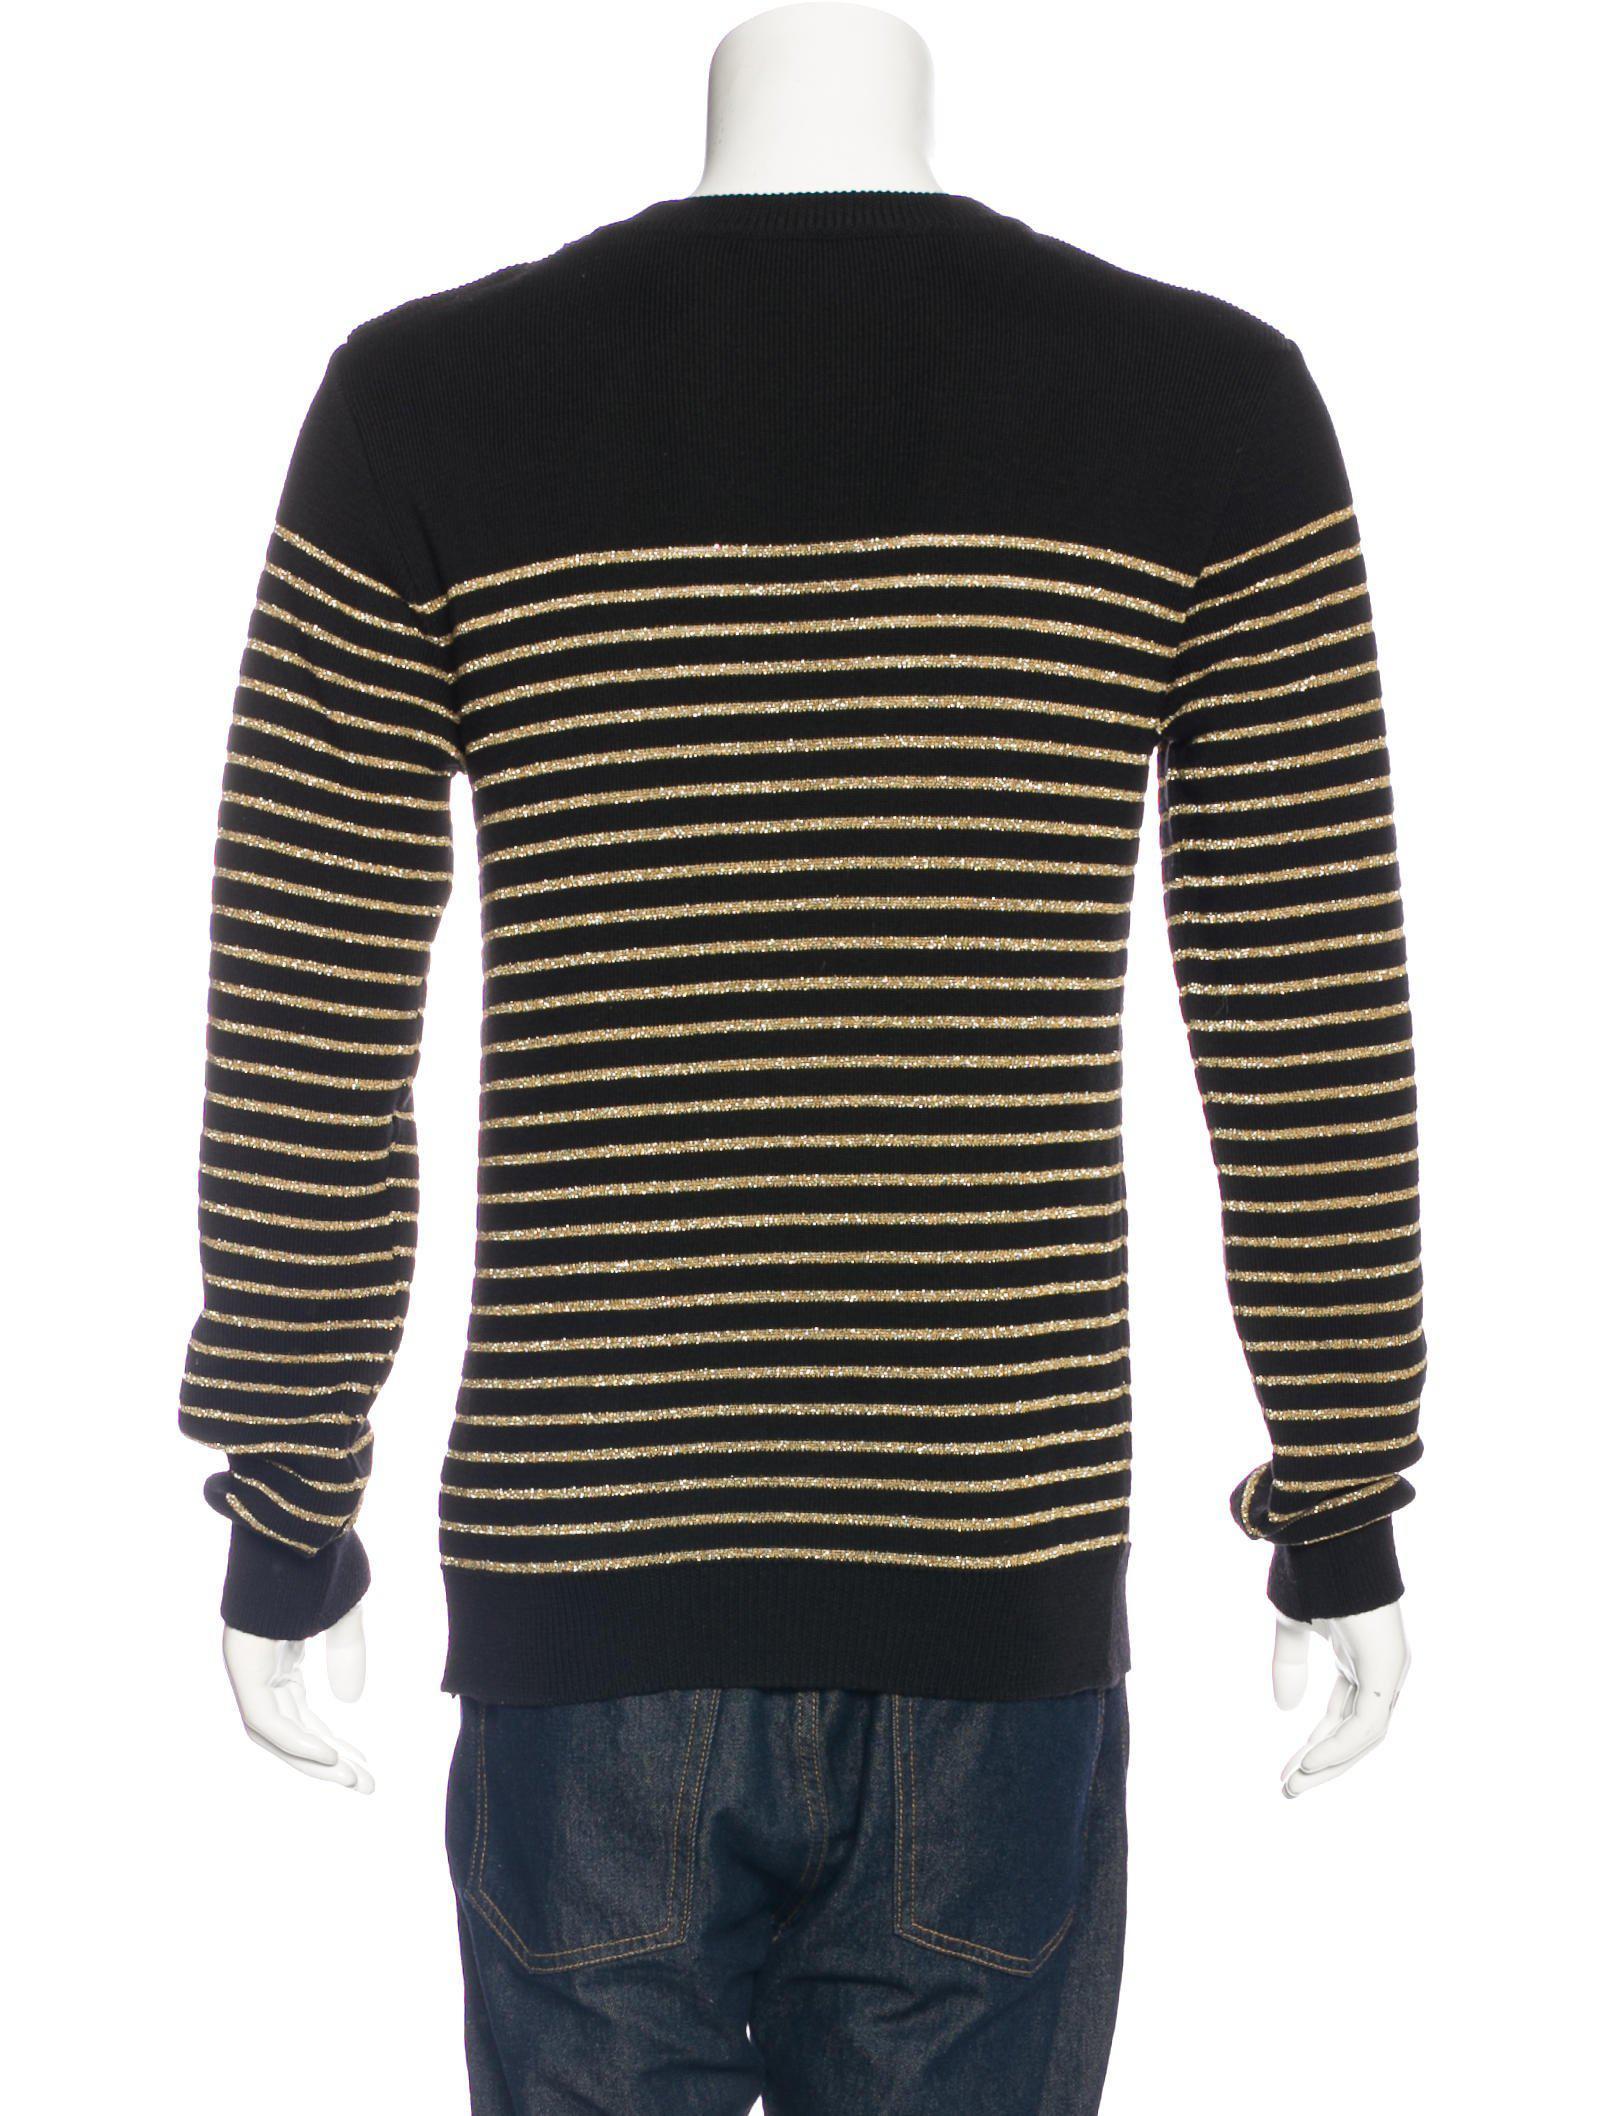 Ebay Online Big Discount Cheap Online metallic striped sweater - Black Balmain x9CYej